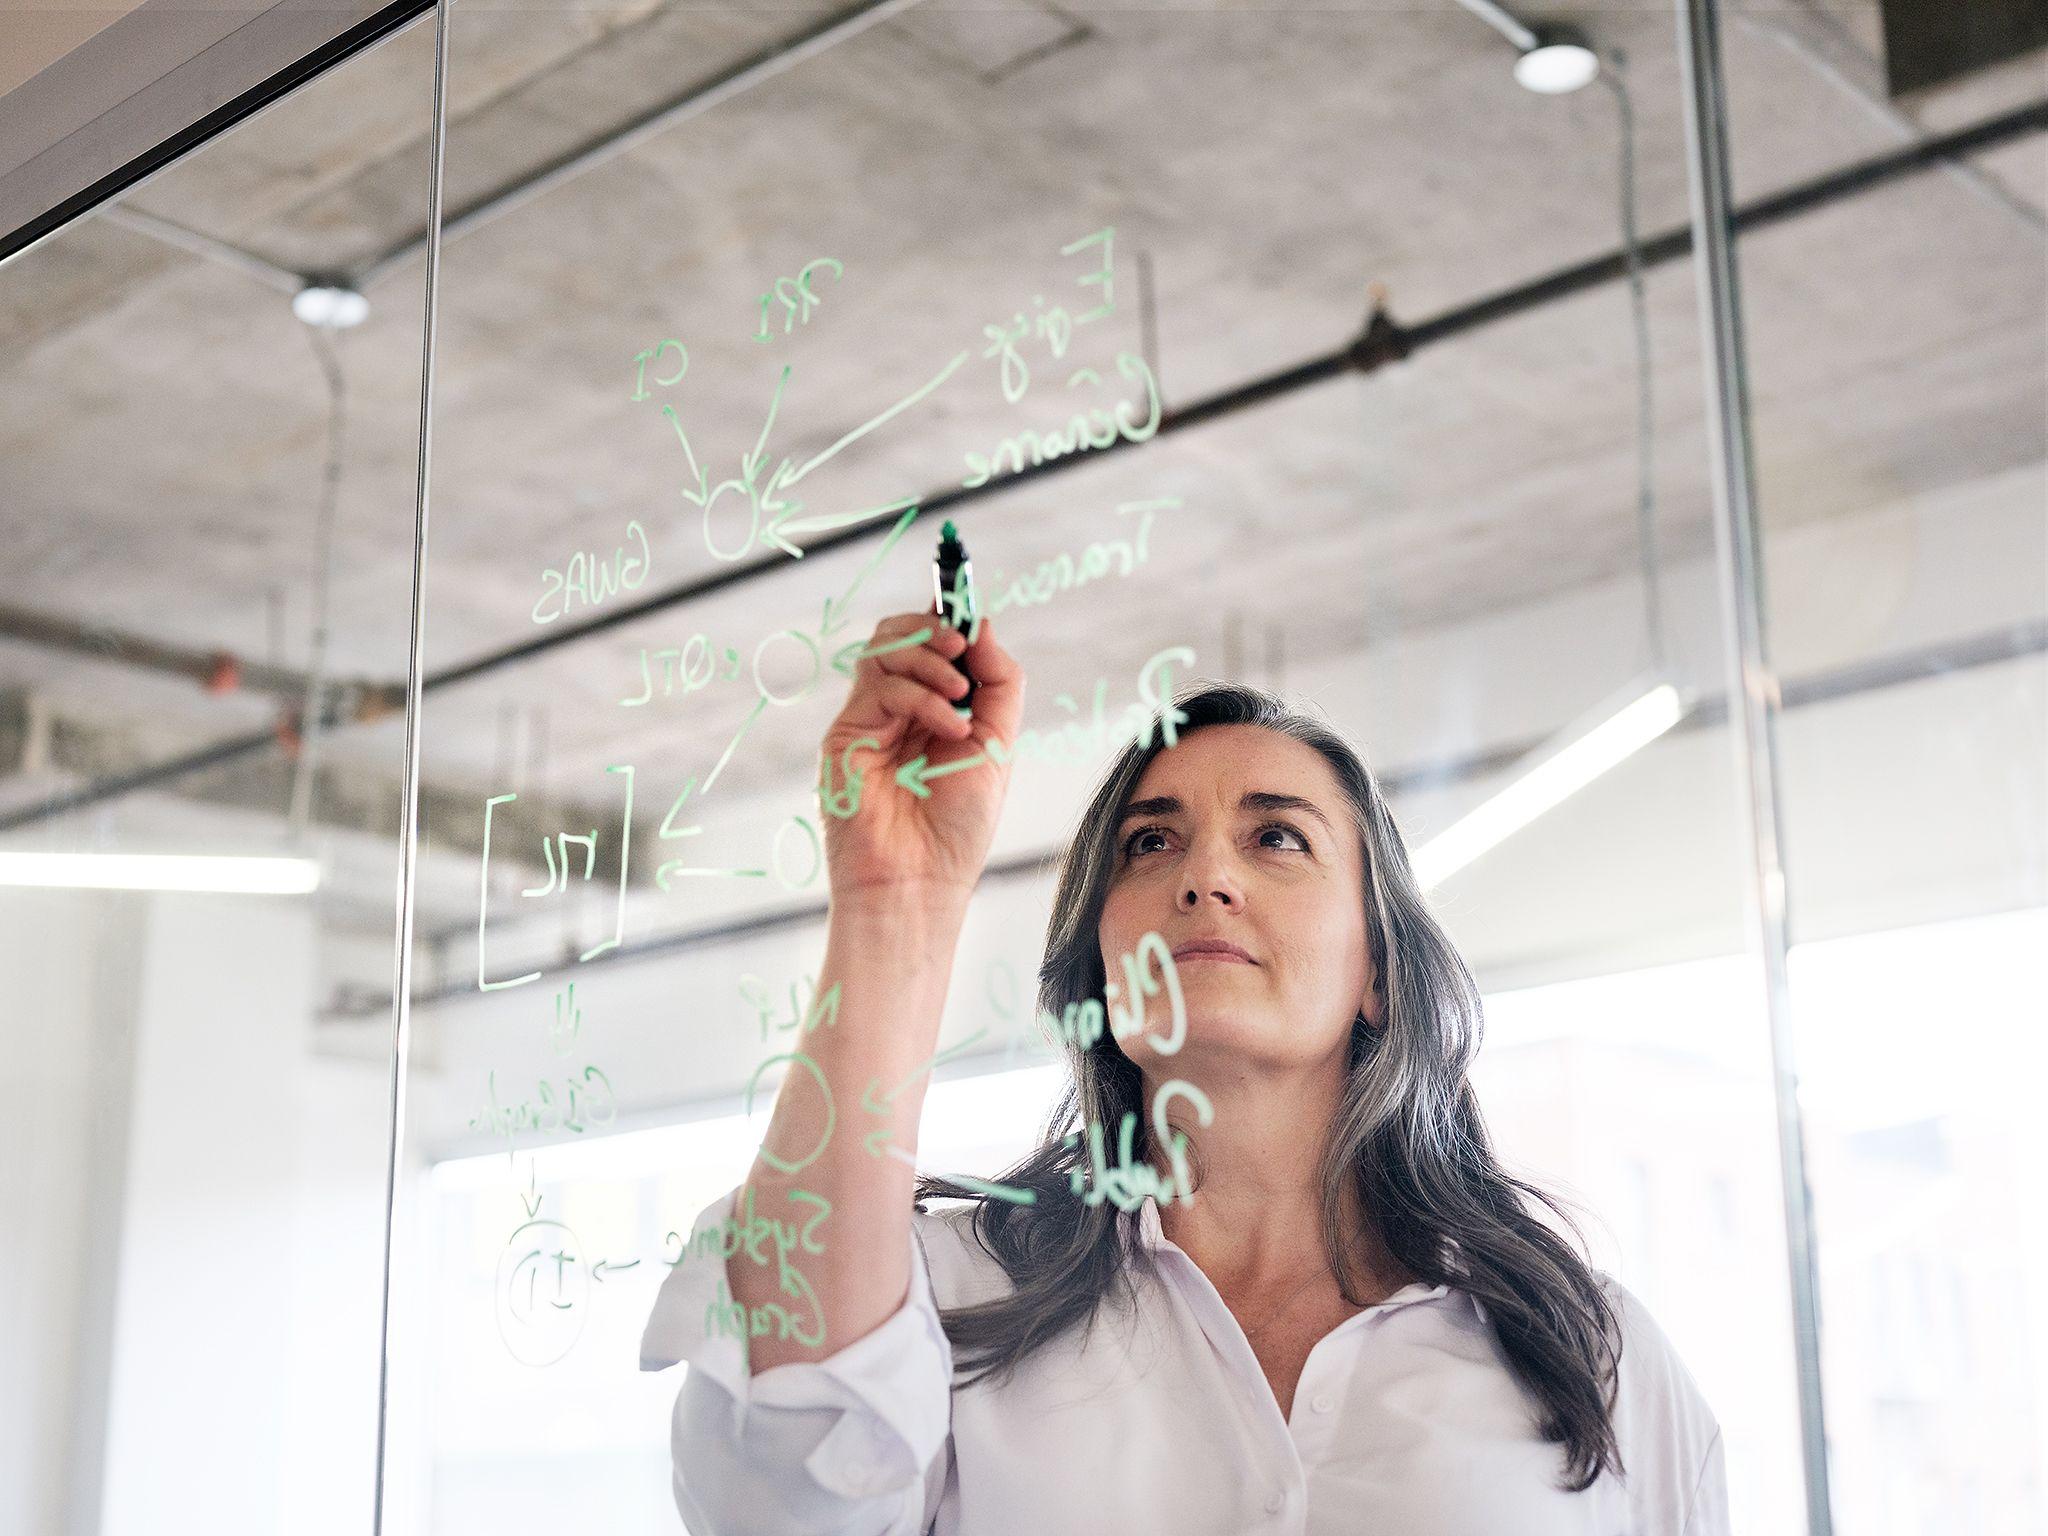 photo of woman writing on an acrylic sheet